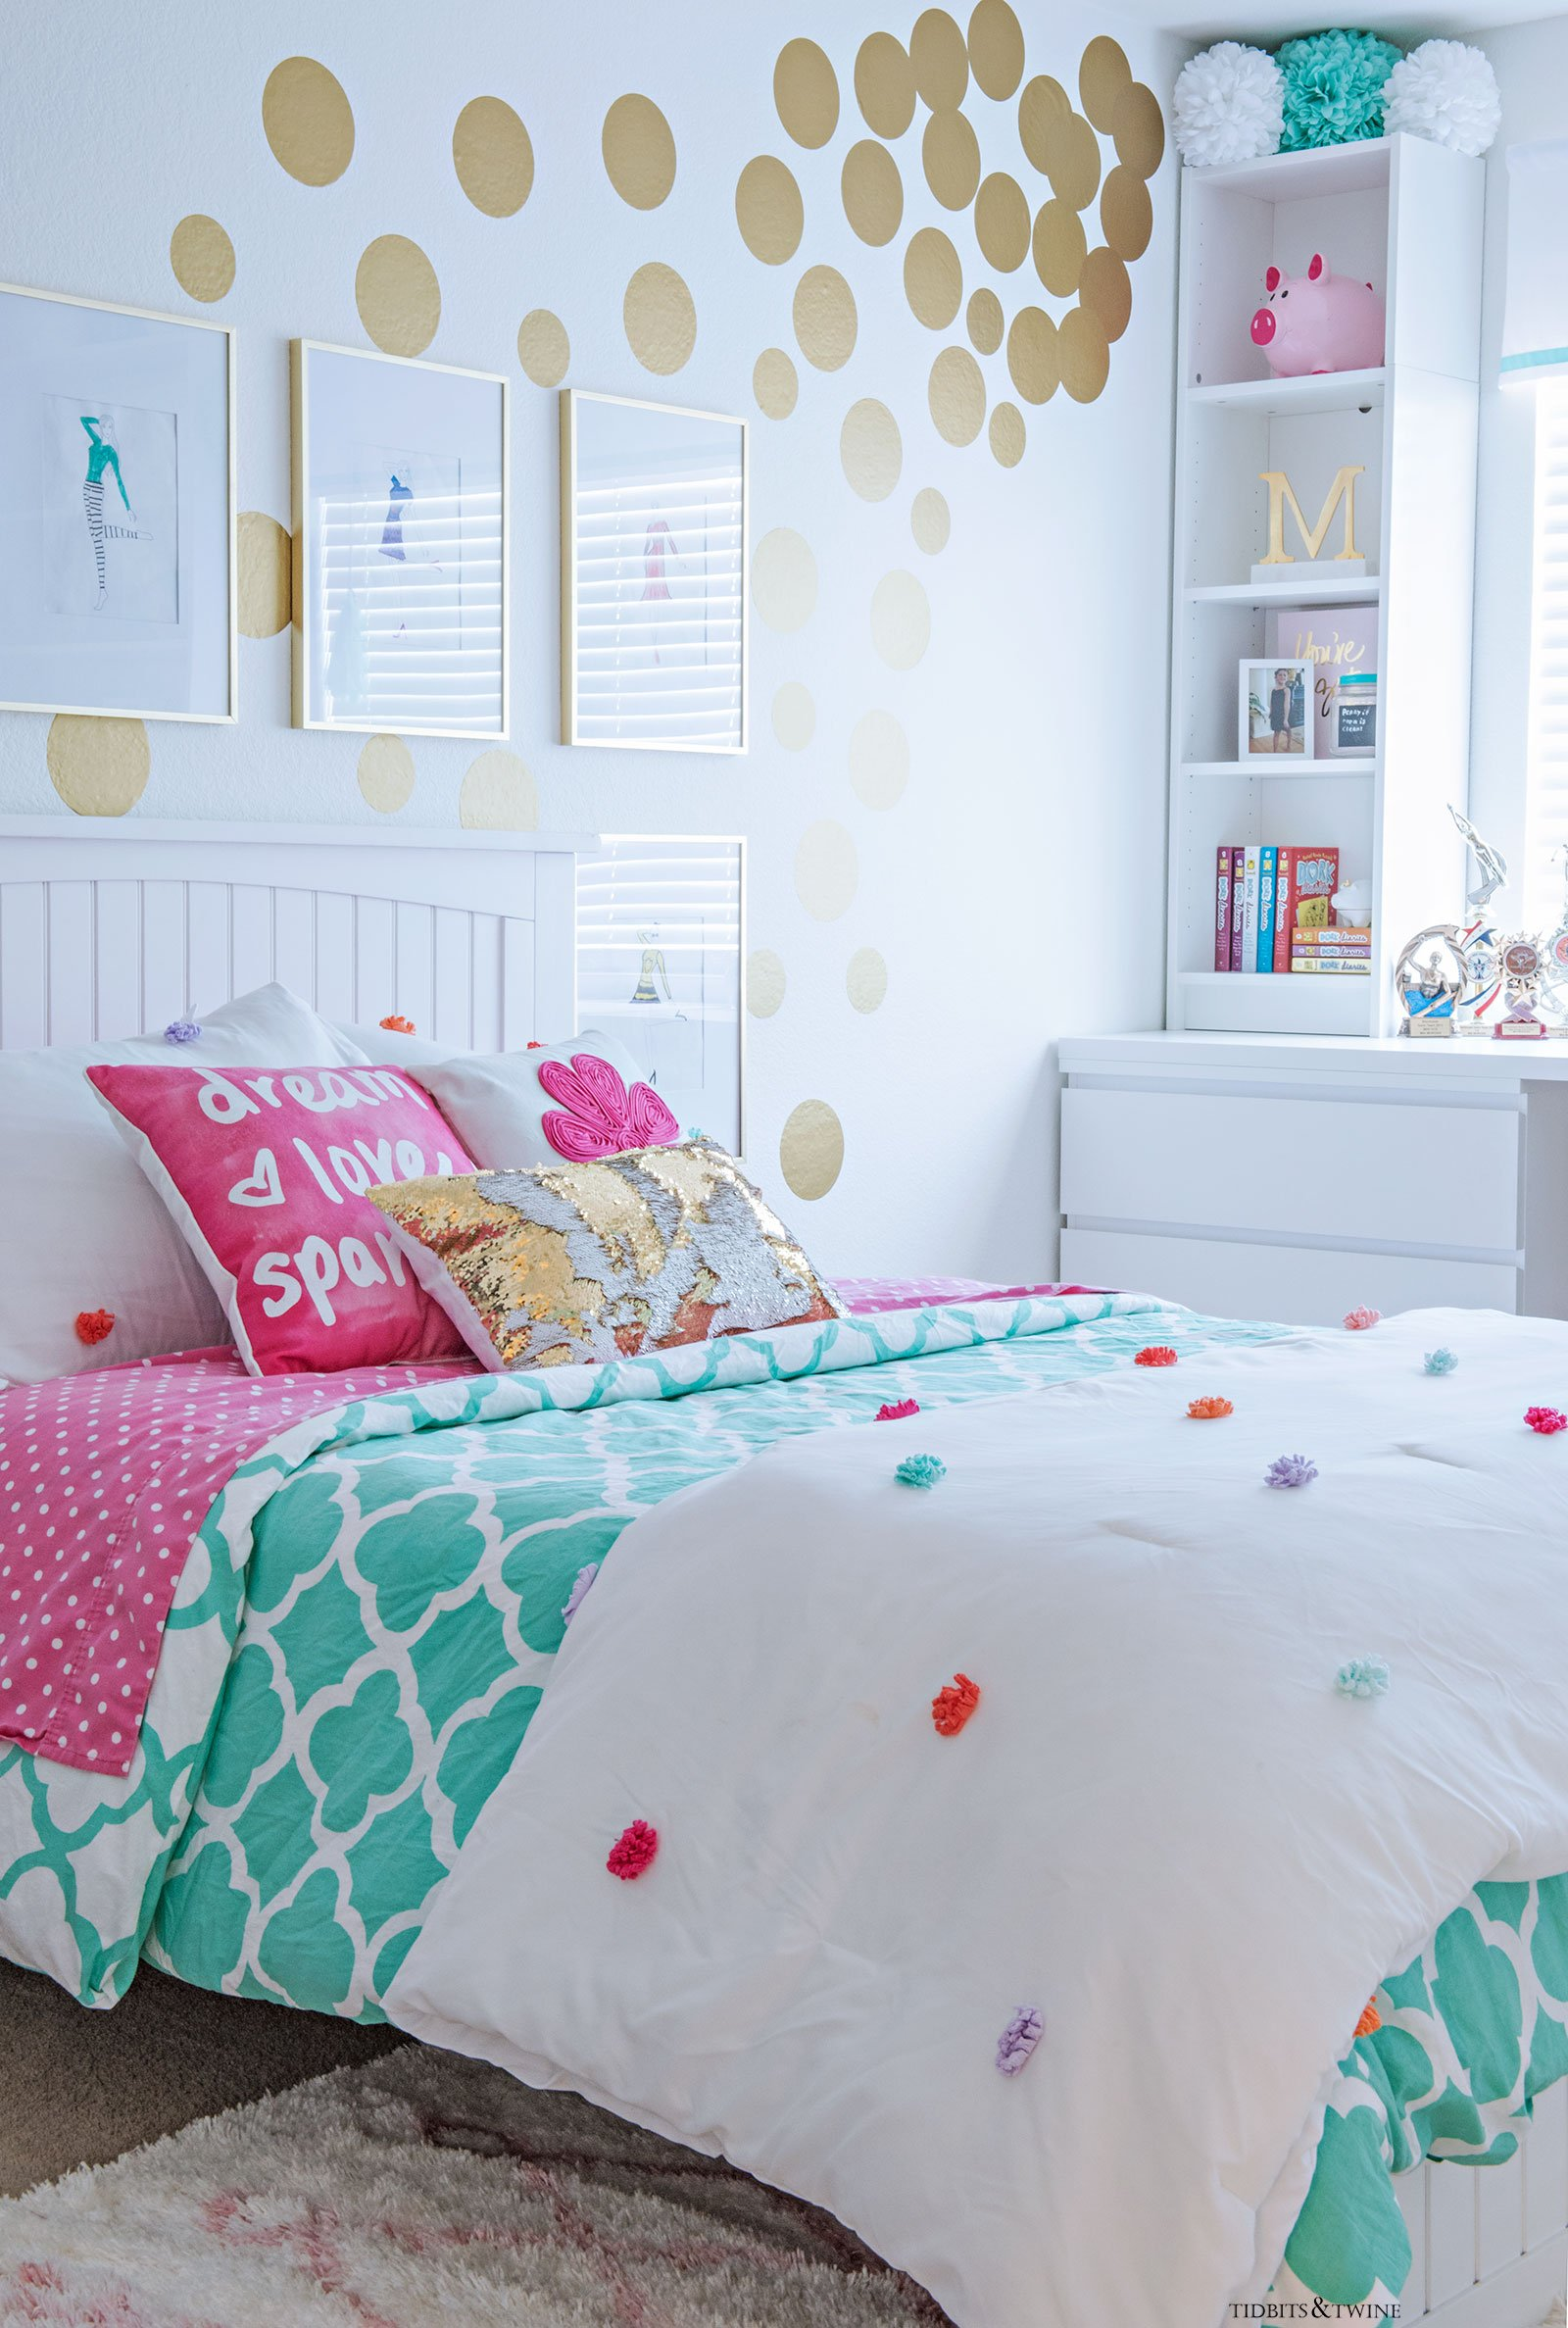 Teen/Tween Girls Bedroom Makeover Idea on a Budget ... on Teen Rooms Girls  id=92081